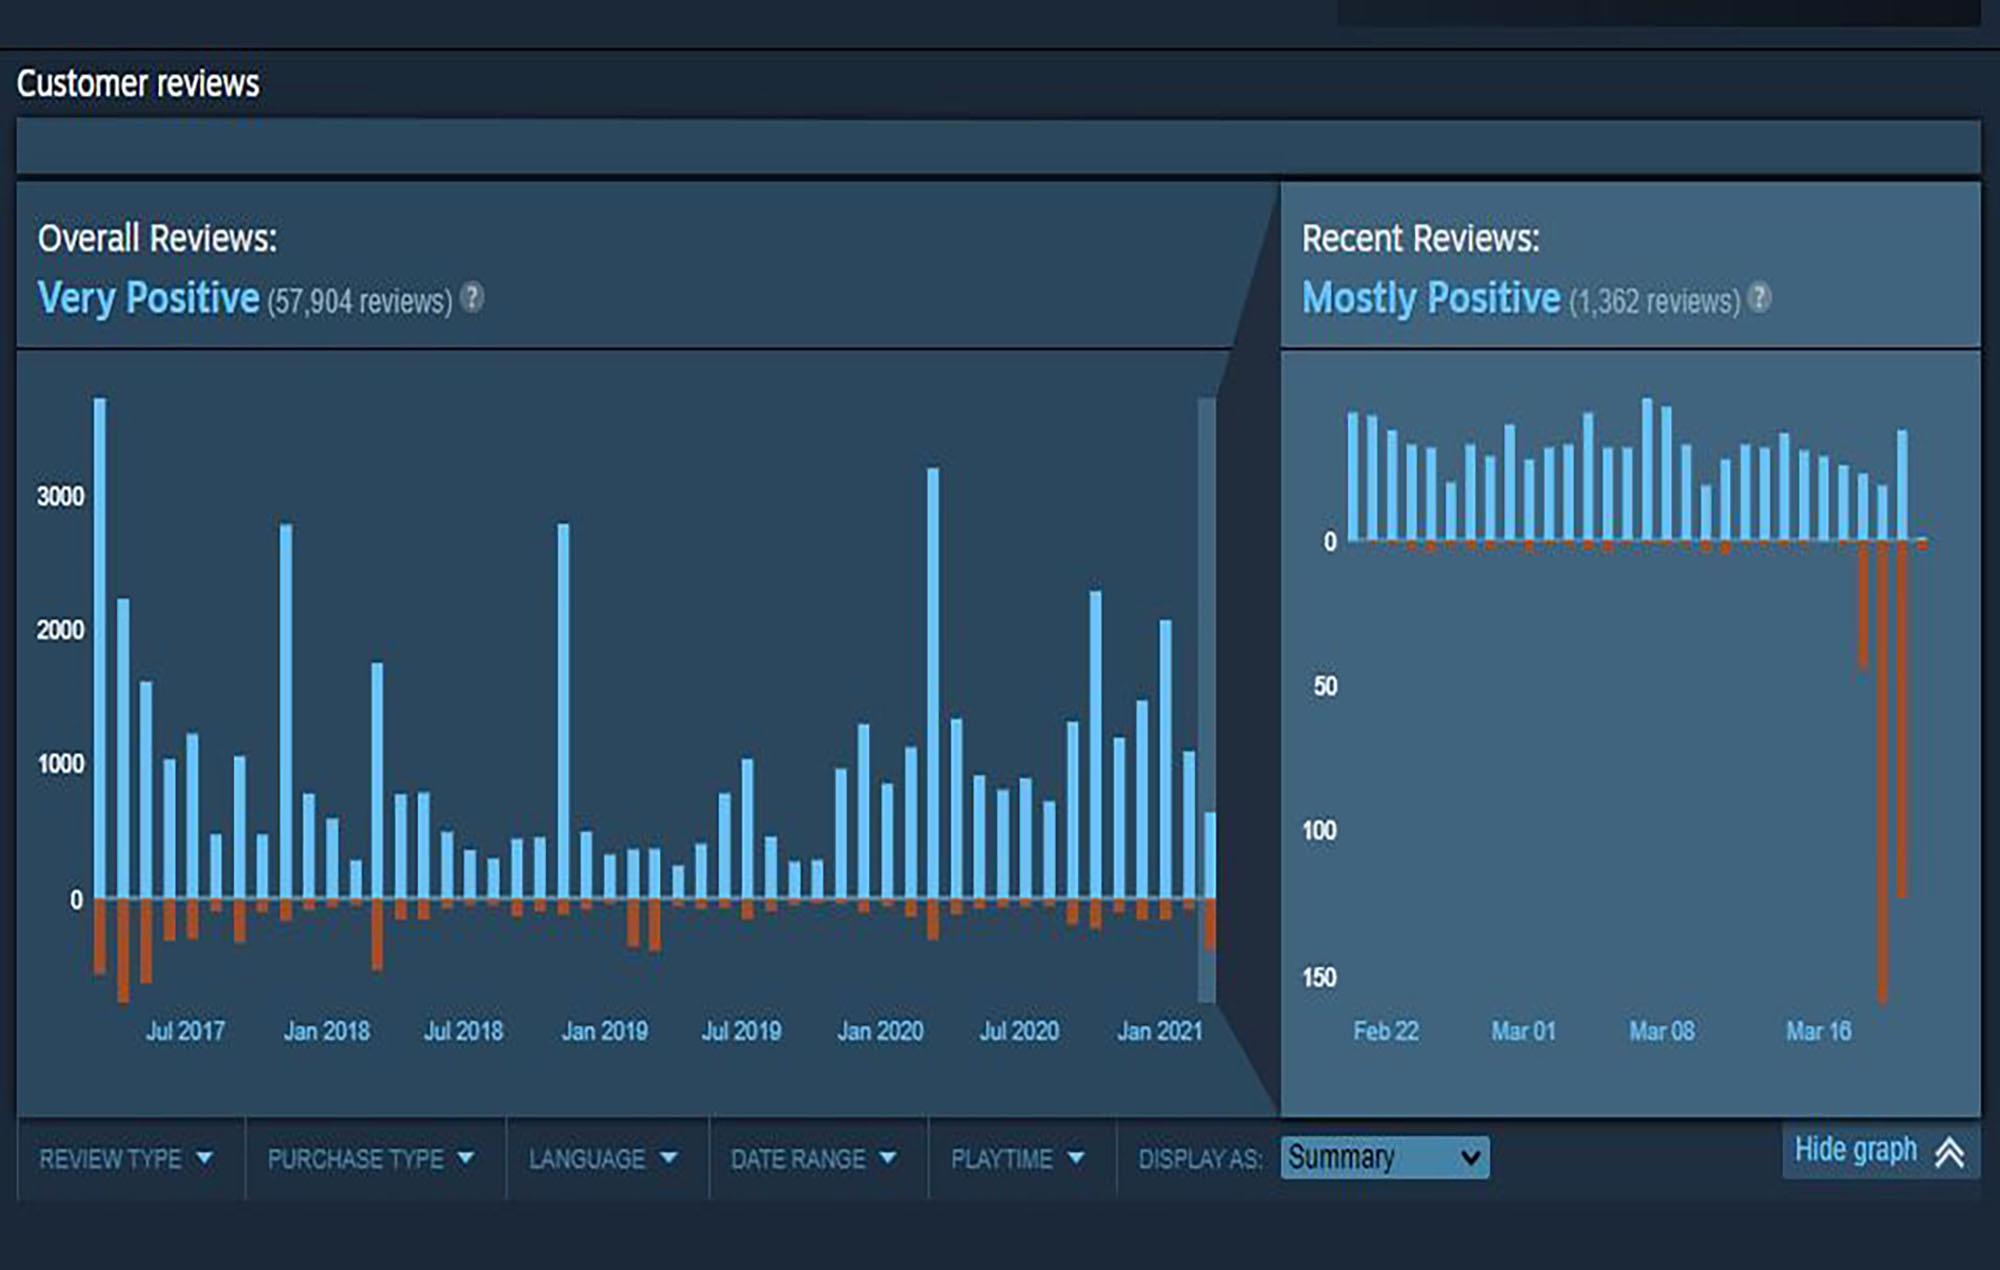 Reviews for Nier: Automata. Image Credit: Valve